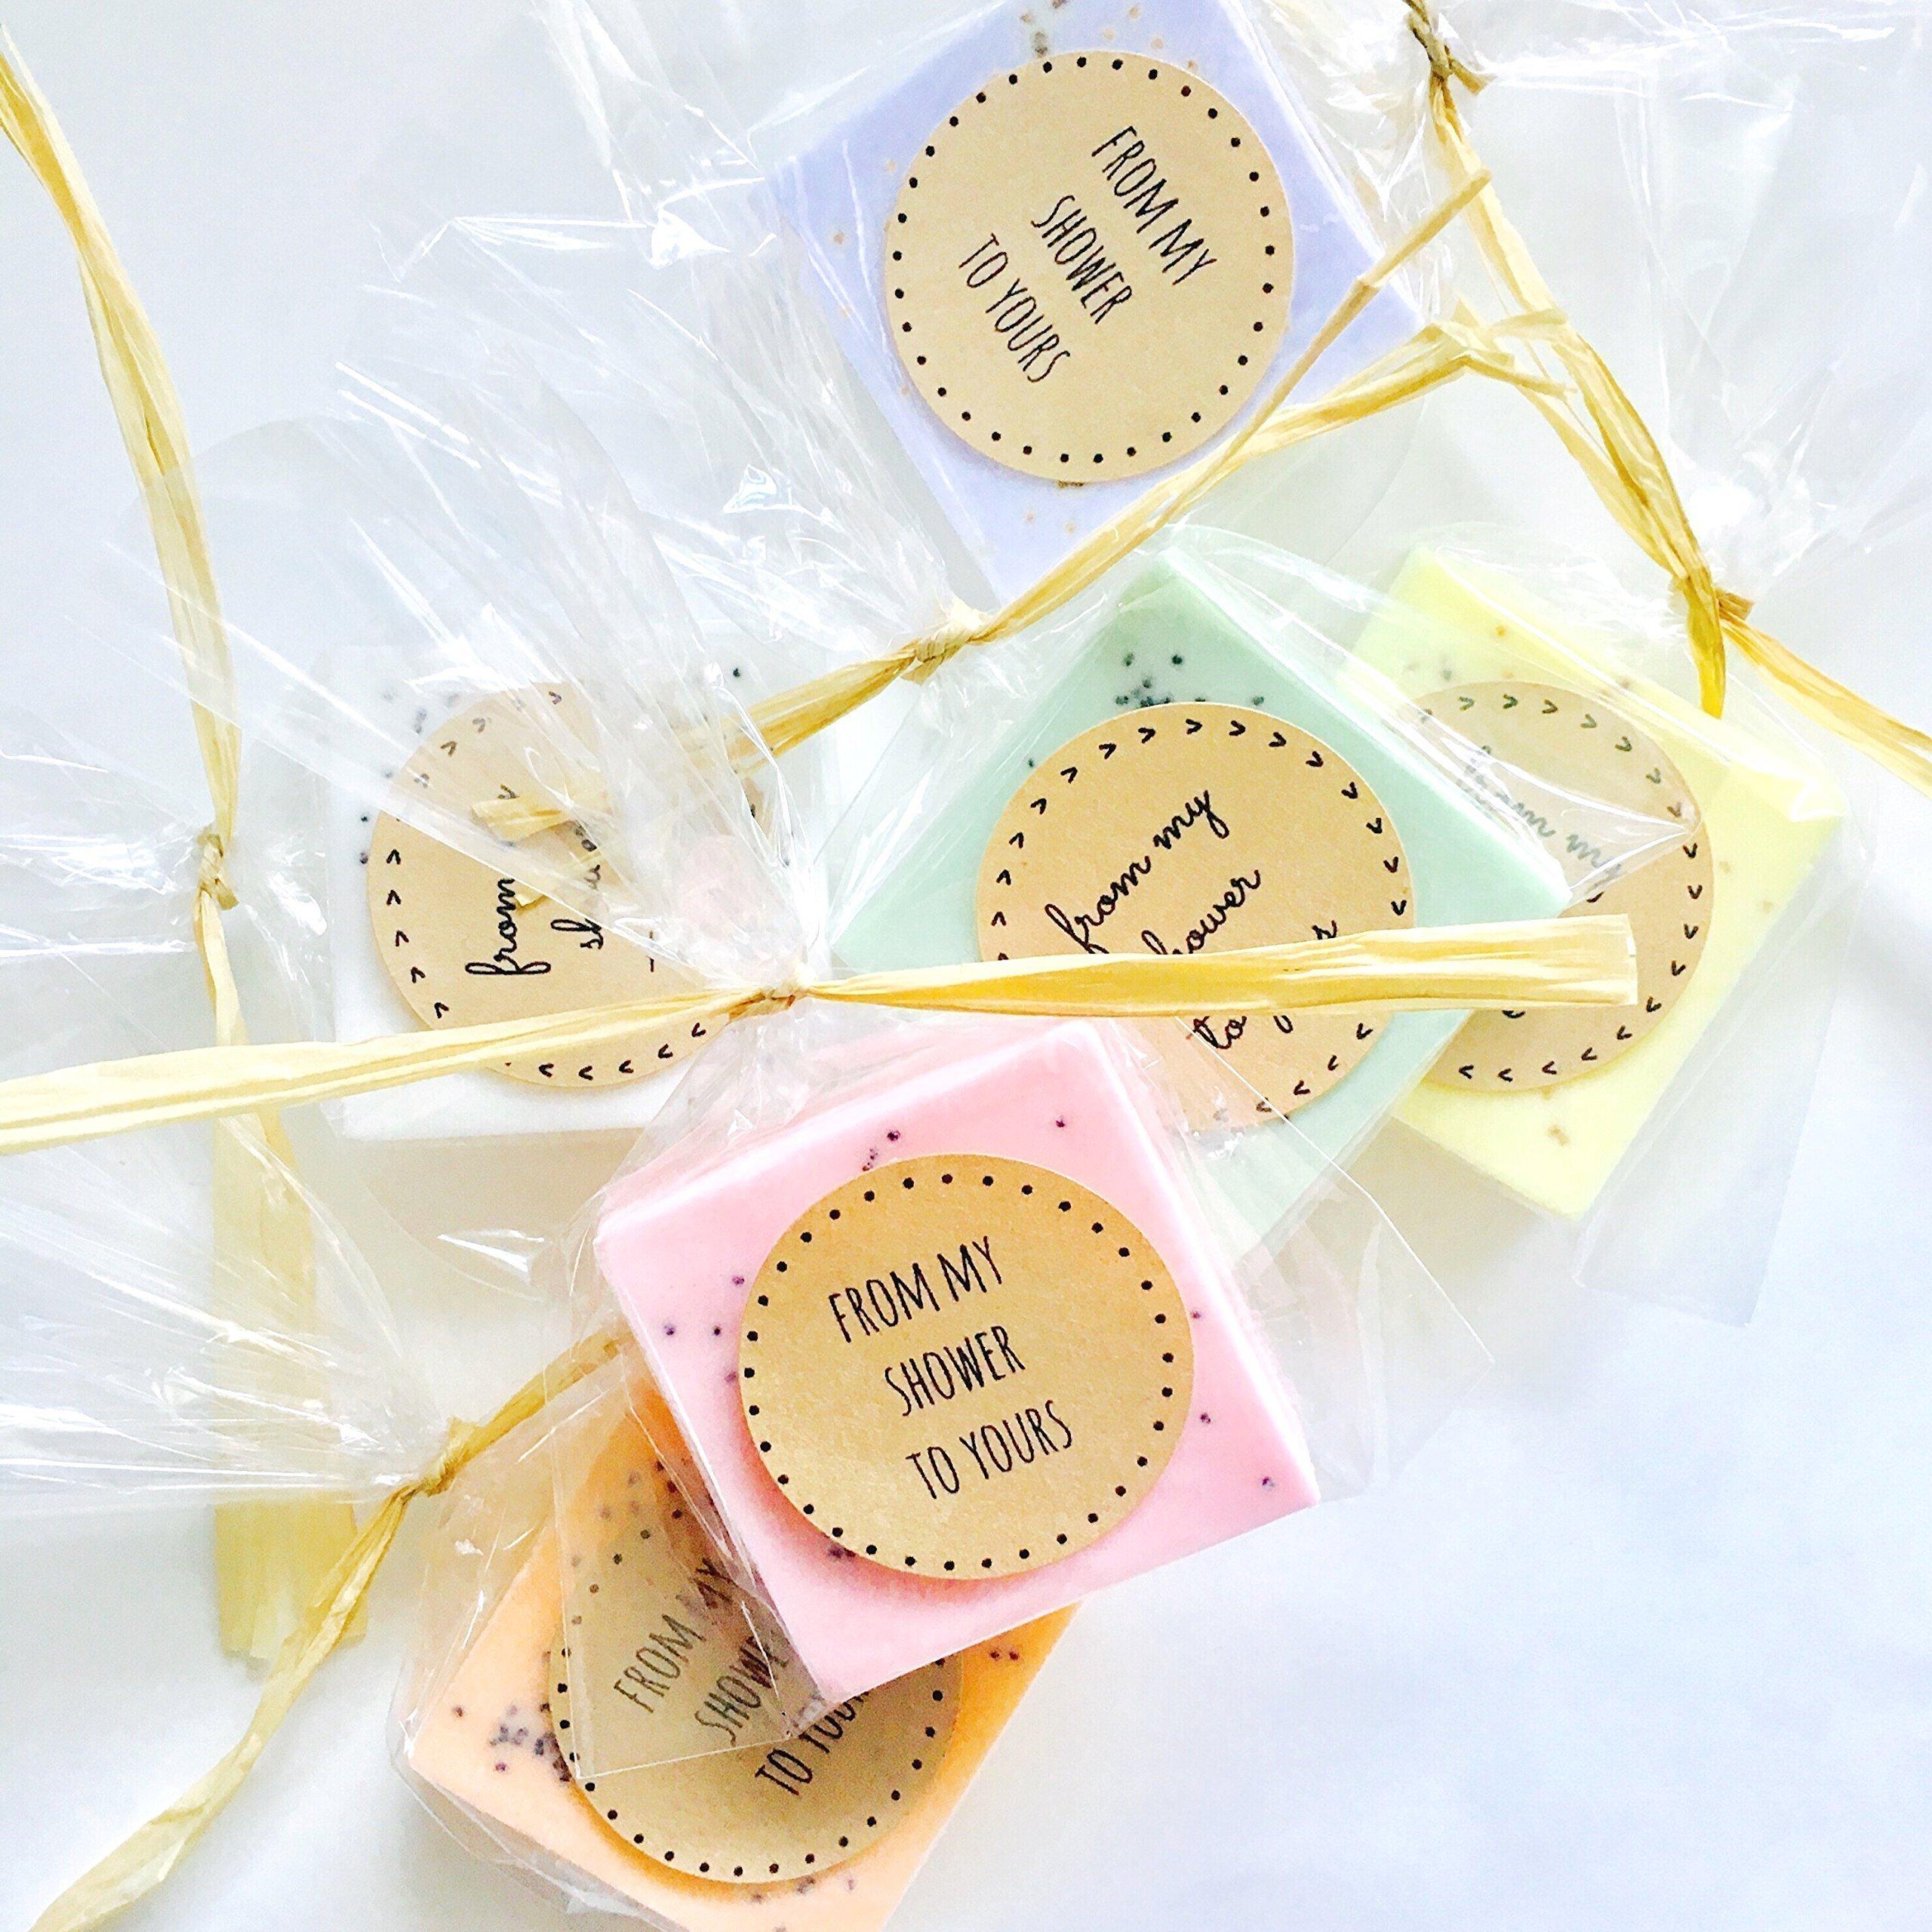 75 Wedding Favors: Soap Favors for Wedding Favors, Bridal Shower Favors, or Baby Shower Favors